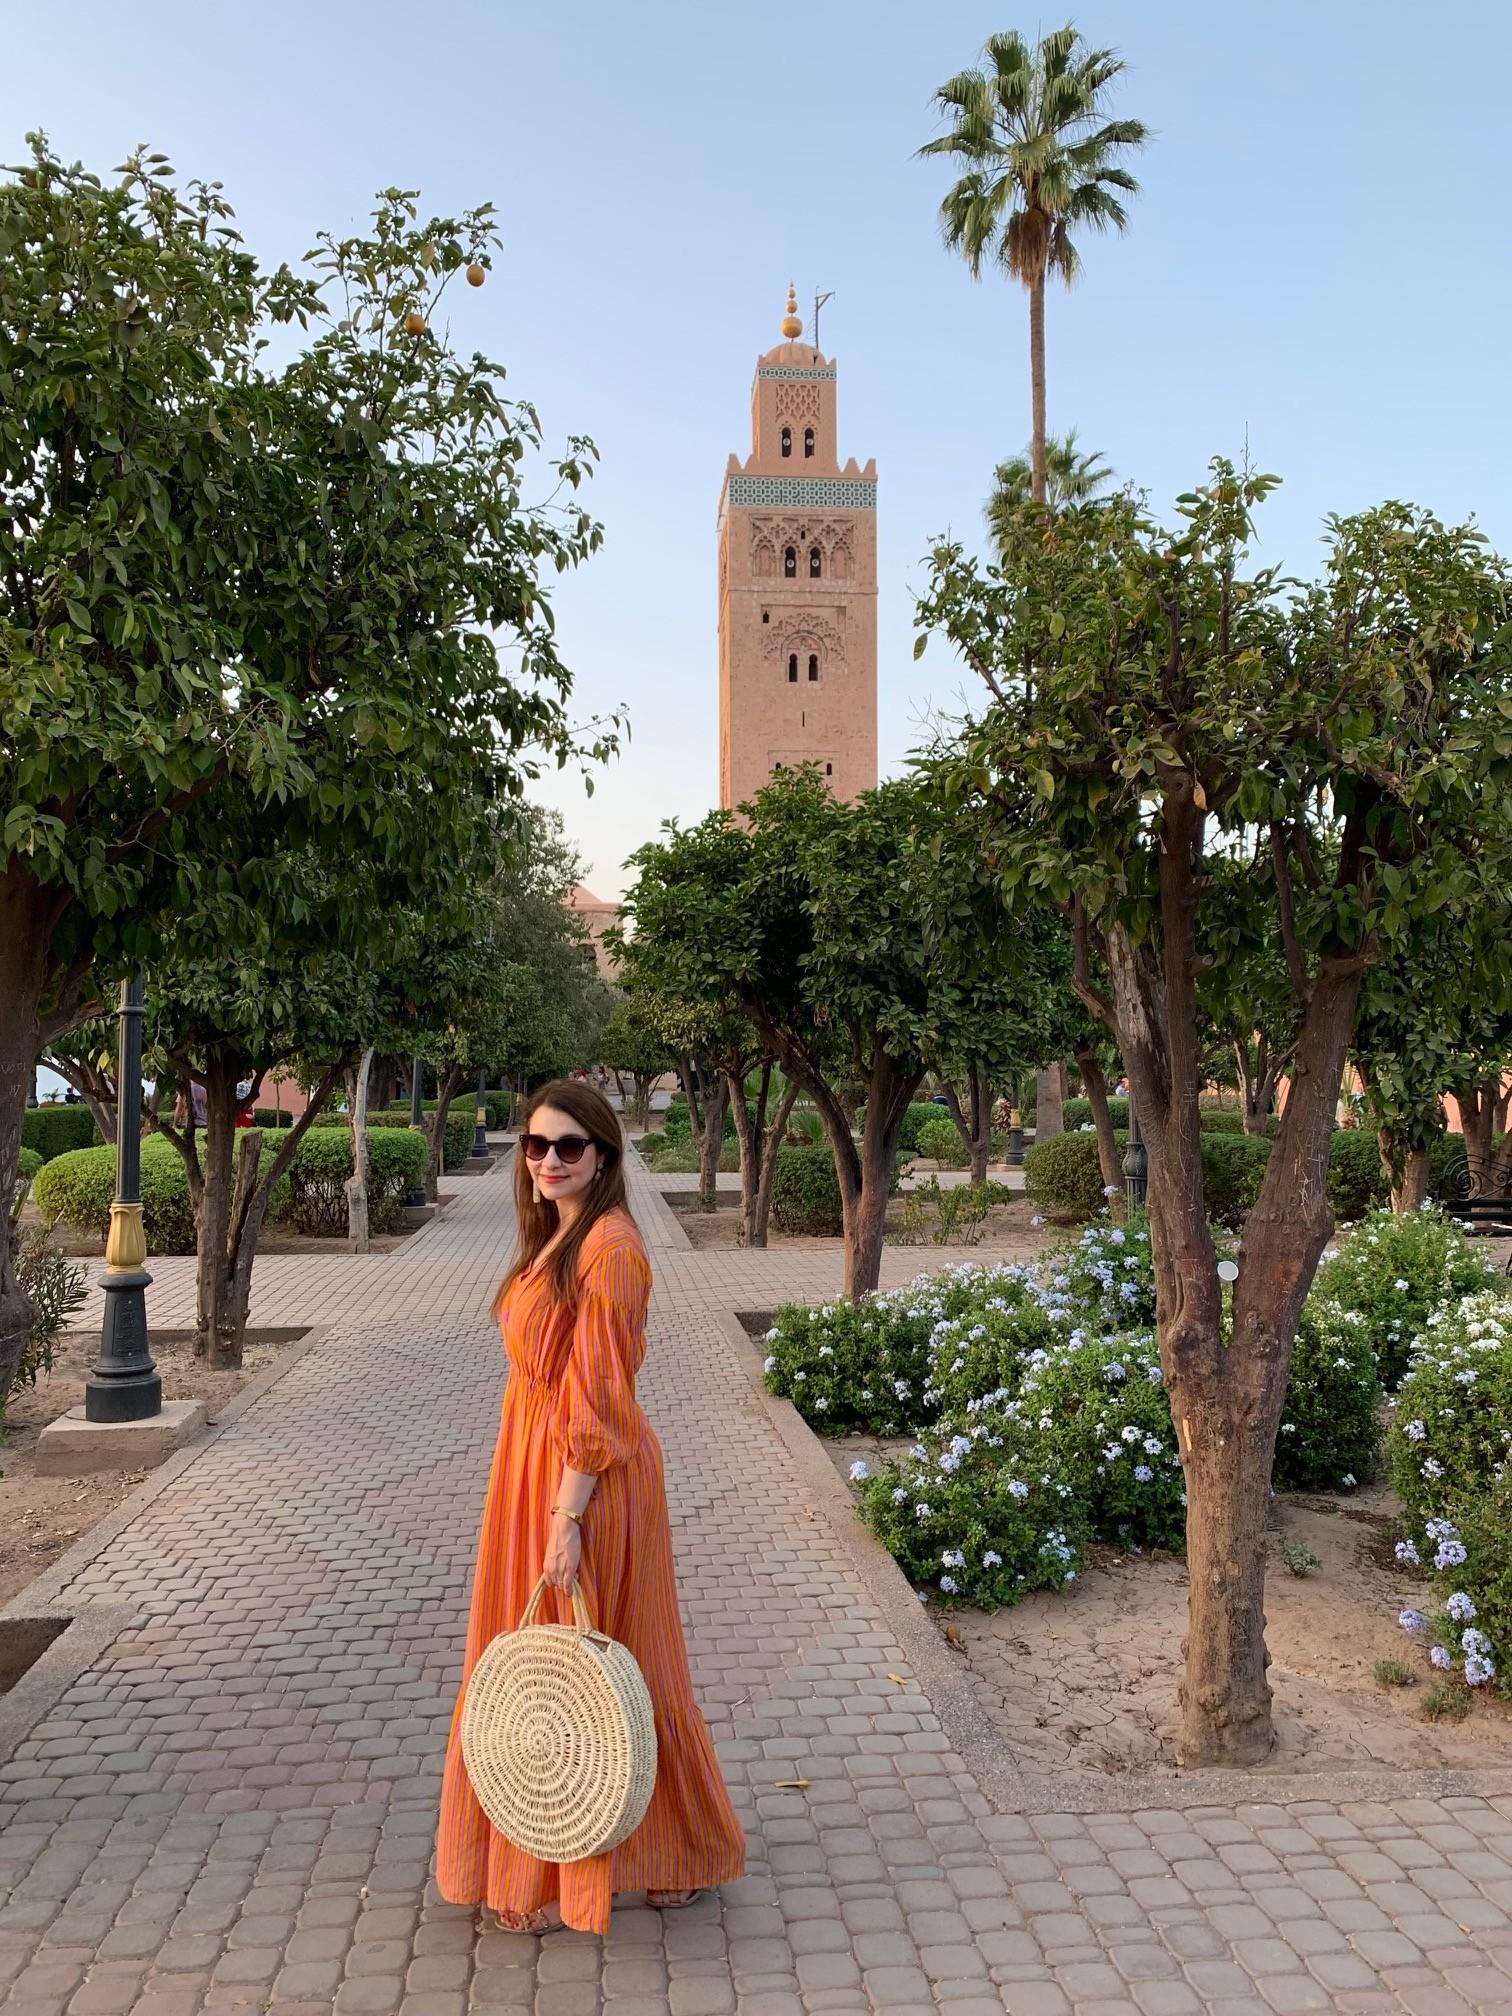 Koutoubia, marrakech, the-alyst.com